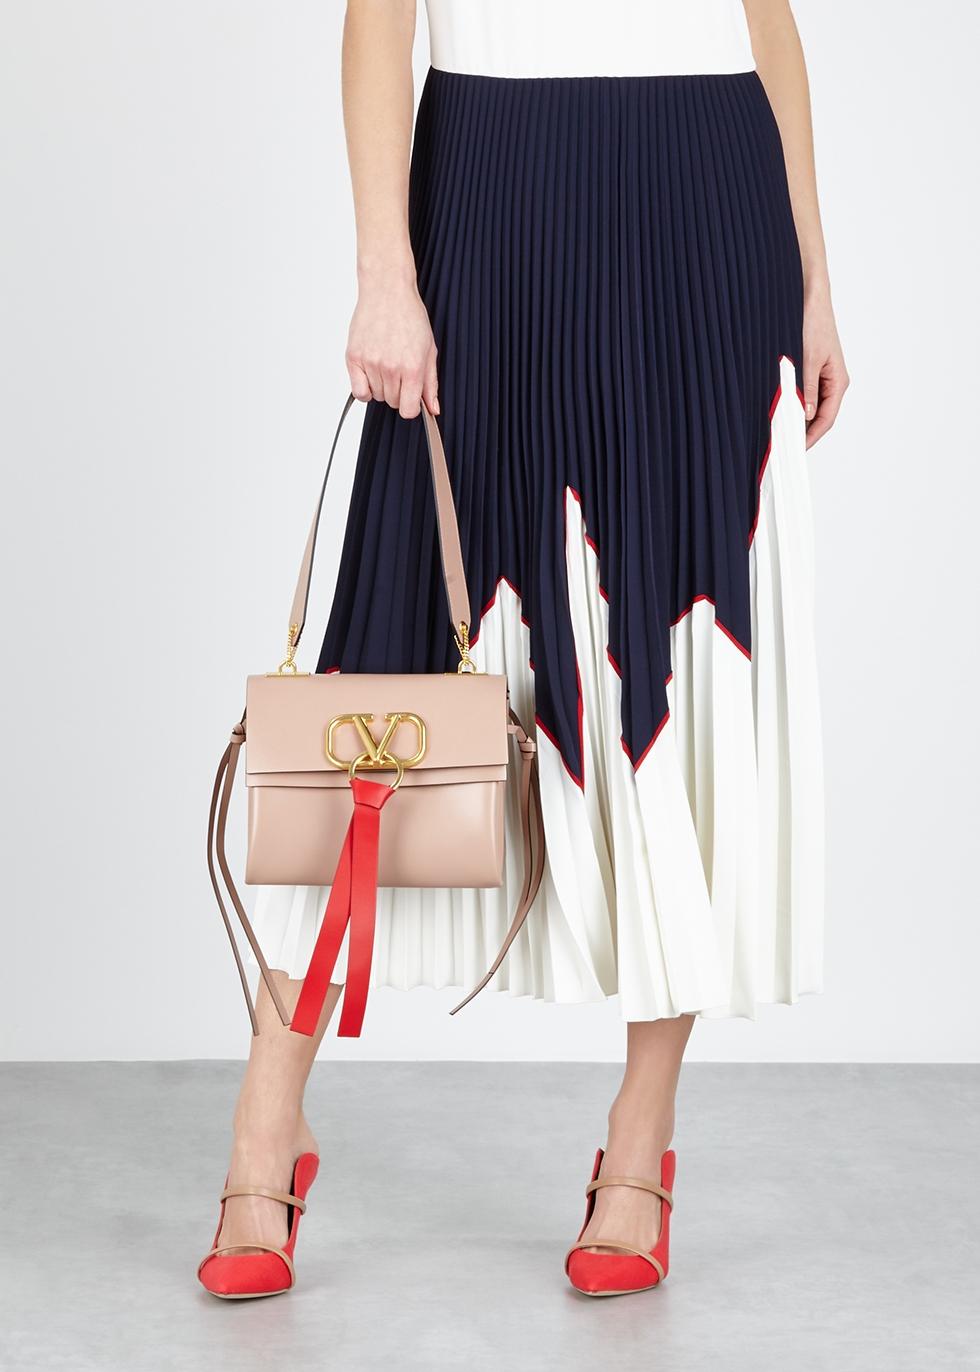 76952086e4 Luxury Wedding Outfits   Accessories - Harvey Nichols